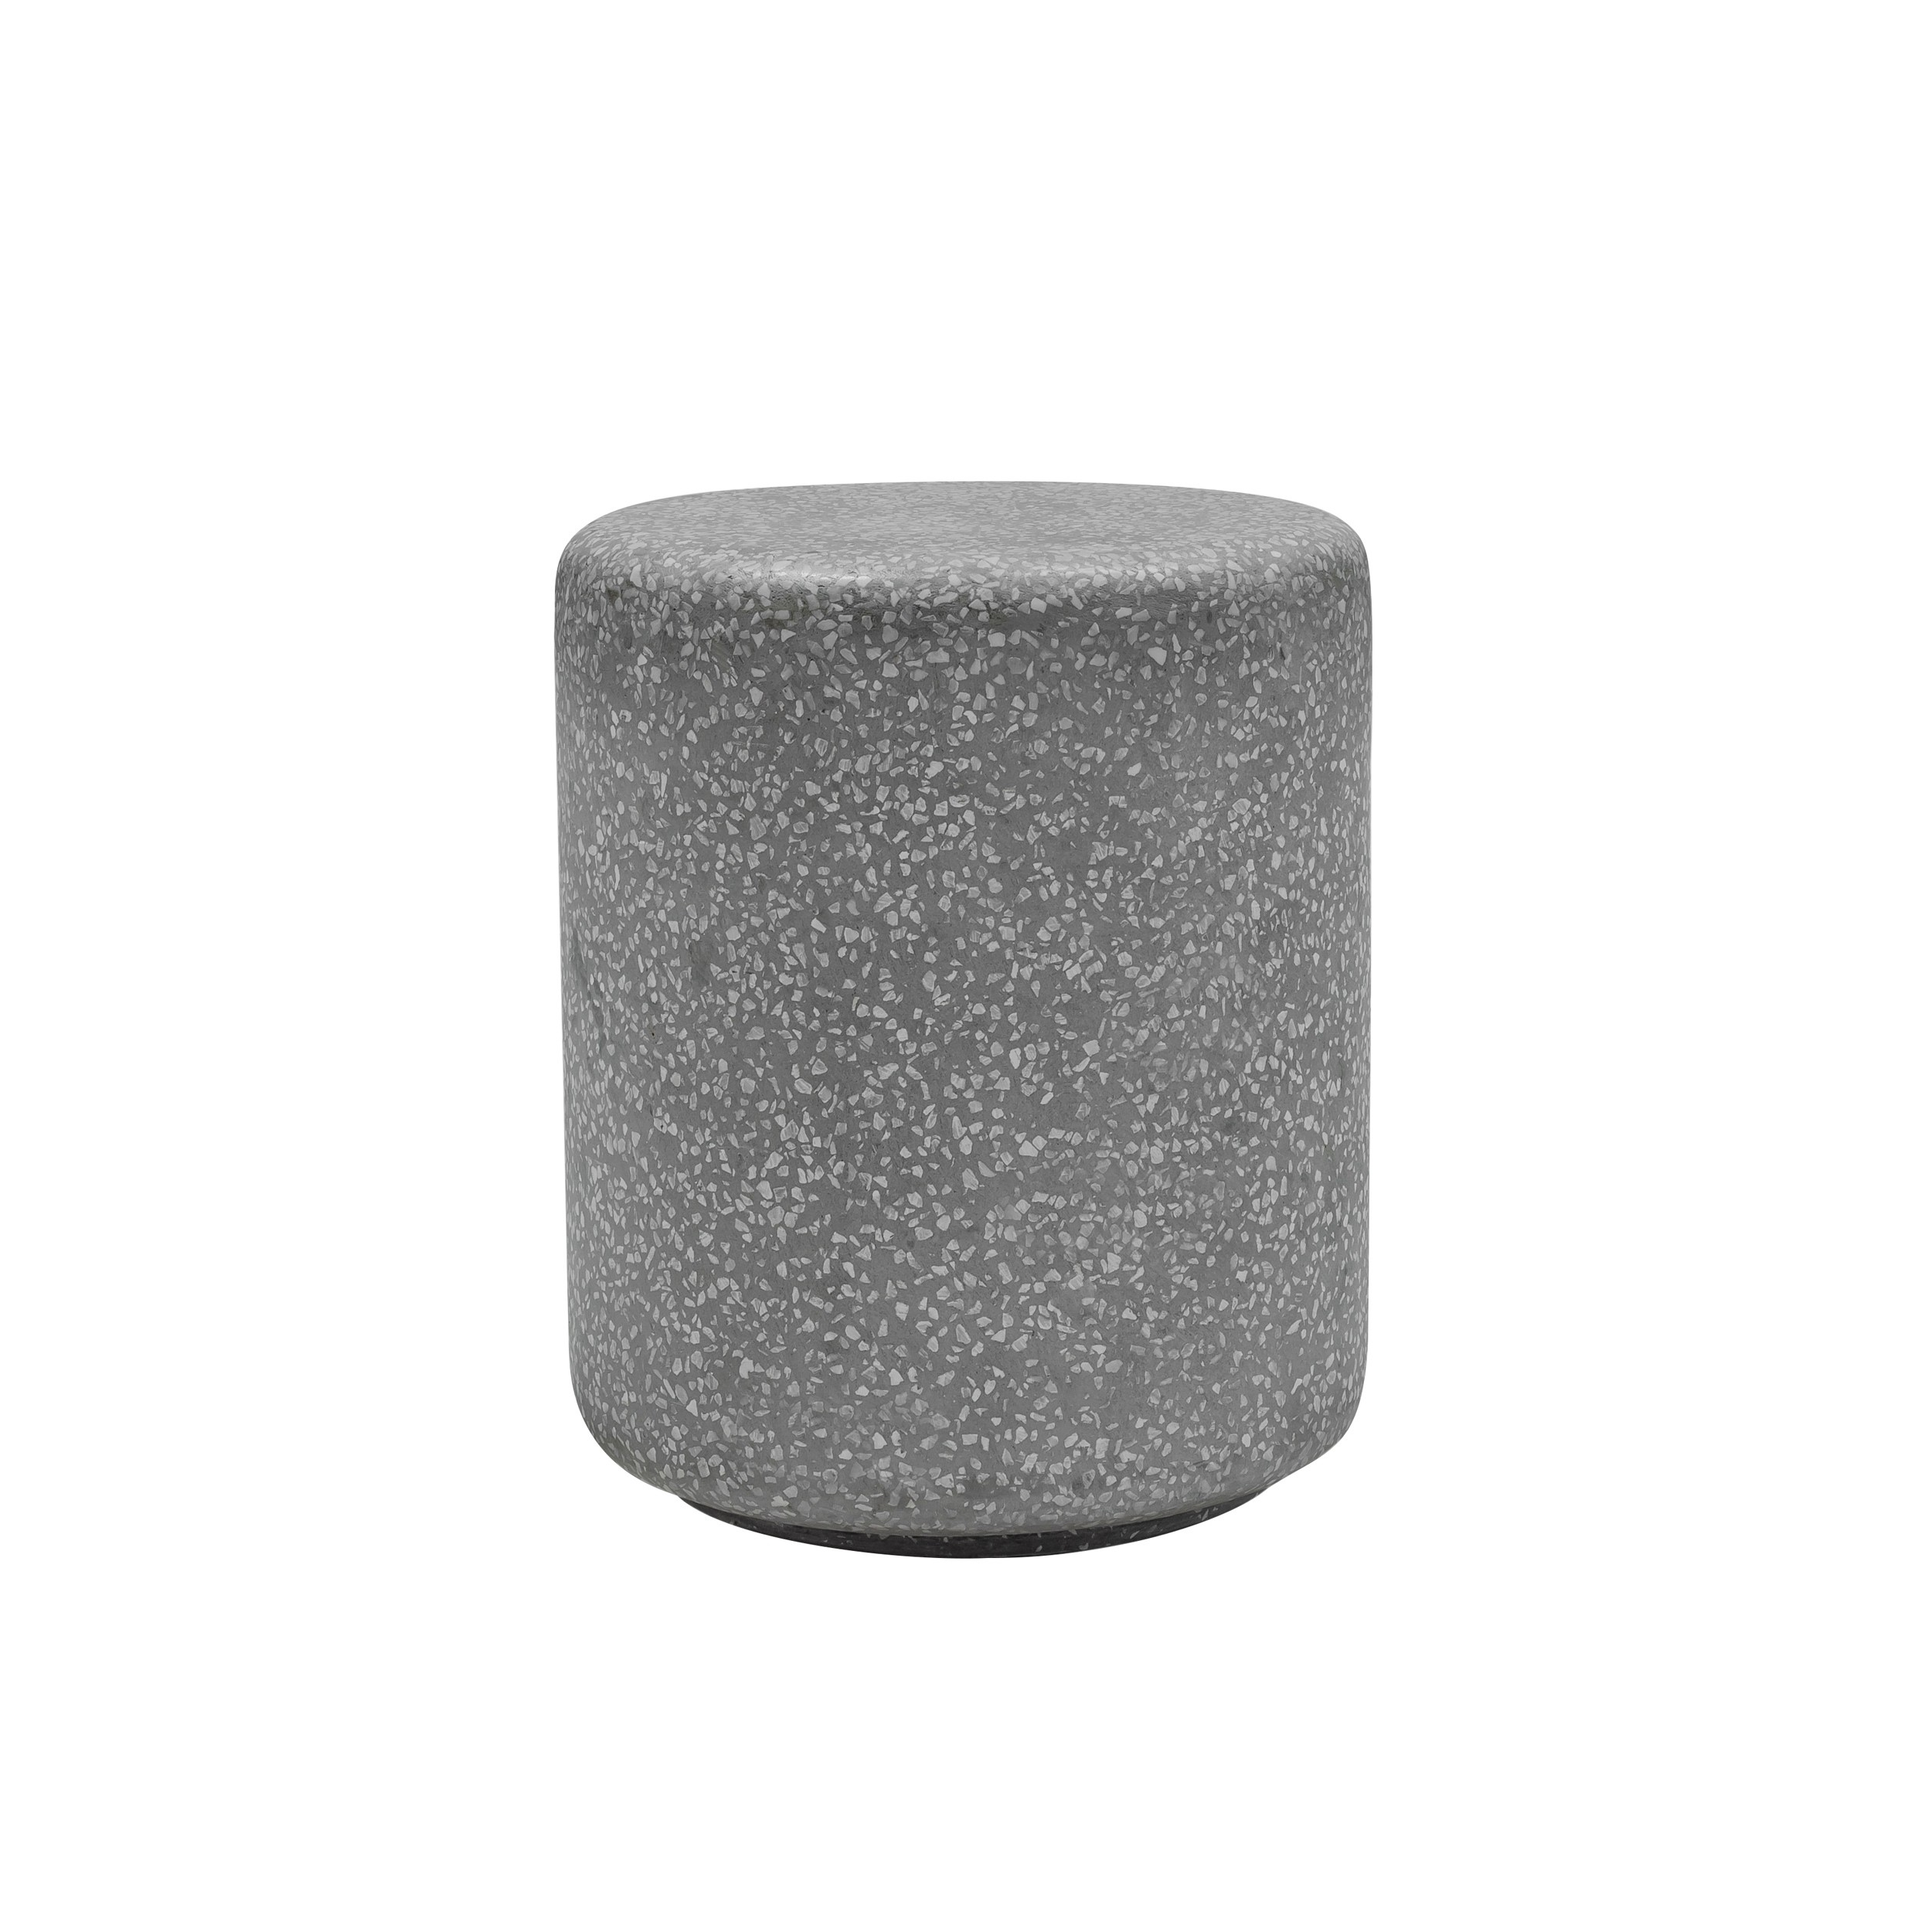 acheter table d appoint en terrazzo gris